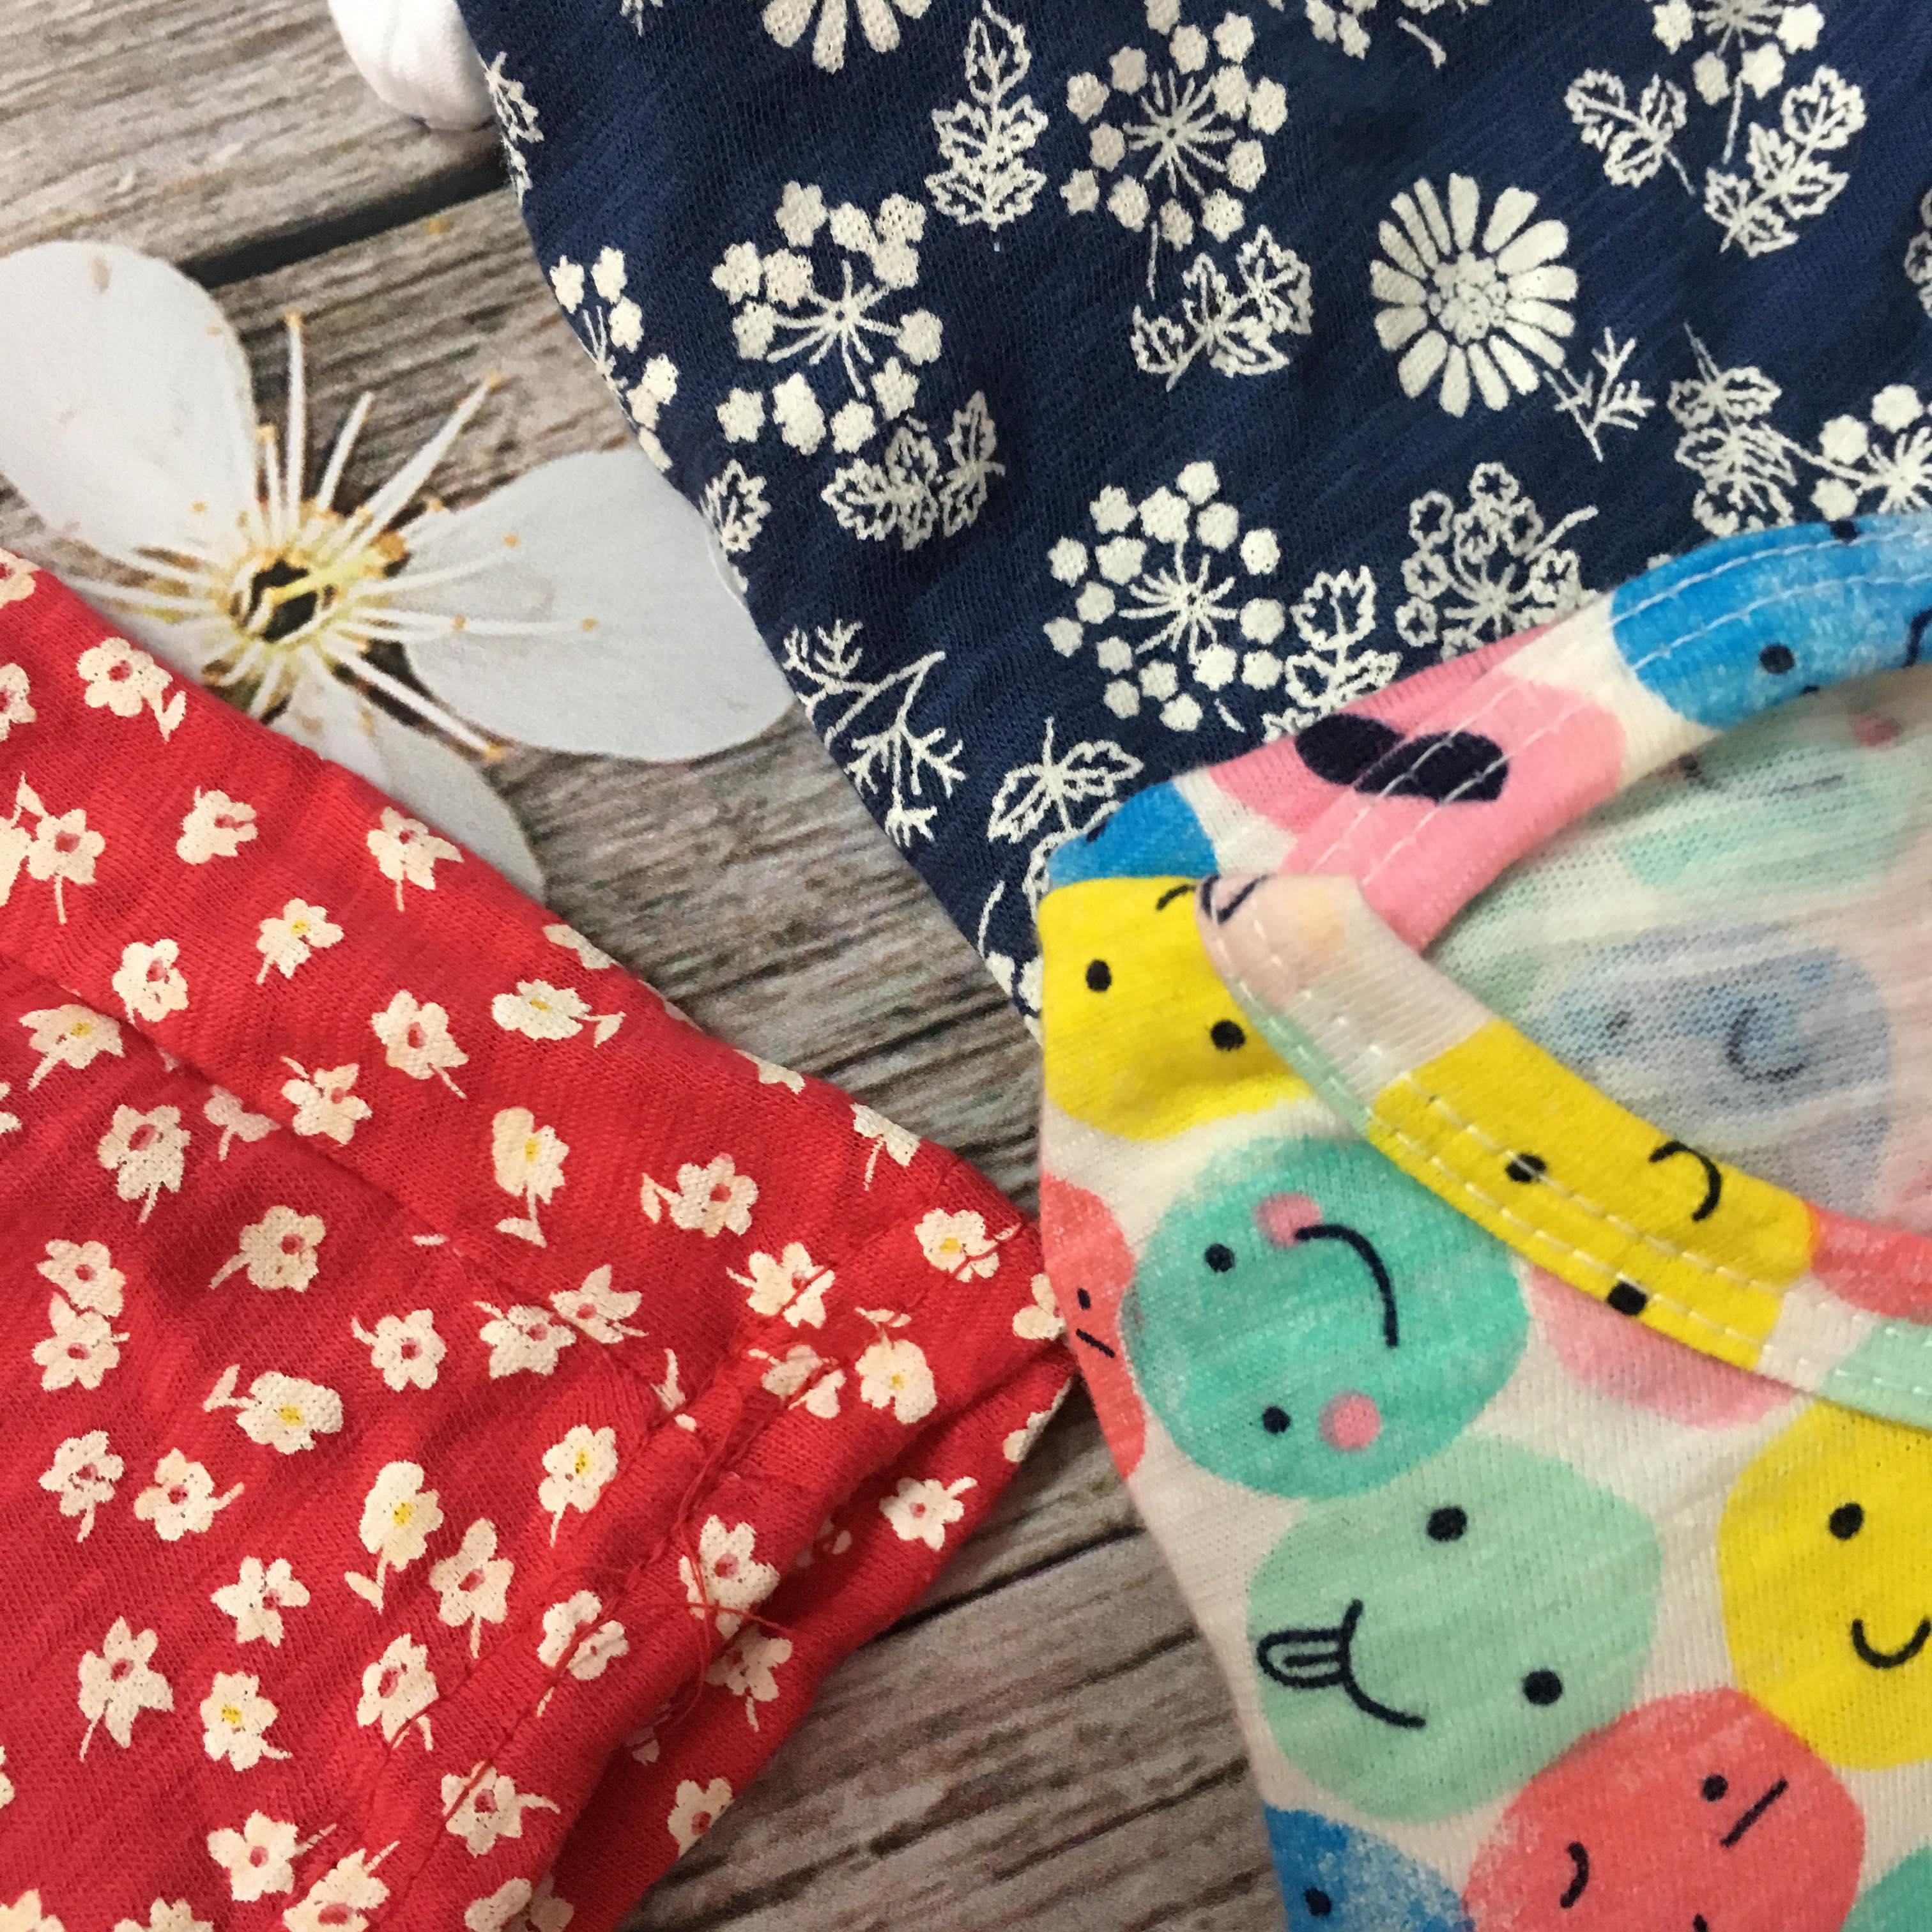 Giá bán Combo 2 Váy cotton co giãn 4 chiều cho bé gái 5 tuổi (VAY01 Mầu sắc bất kỳ)